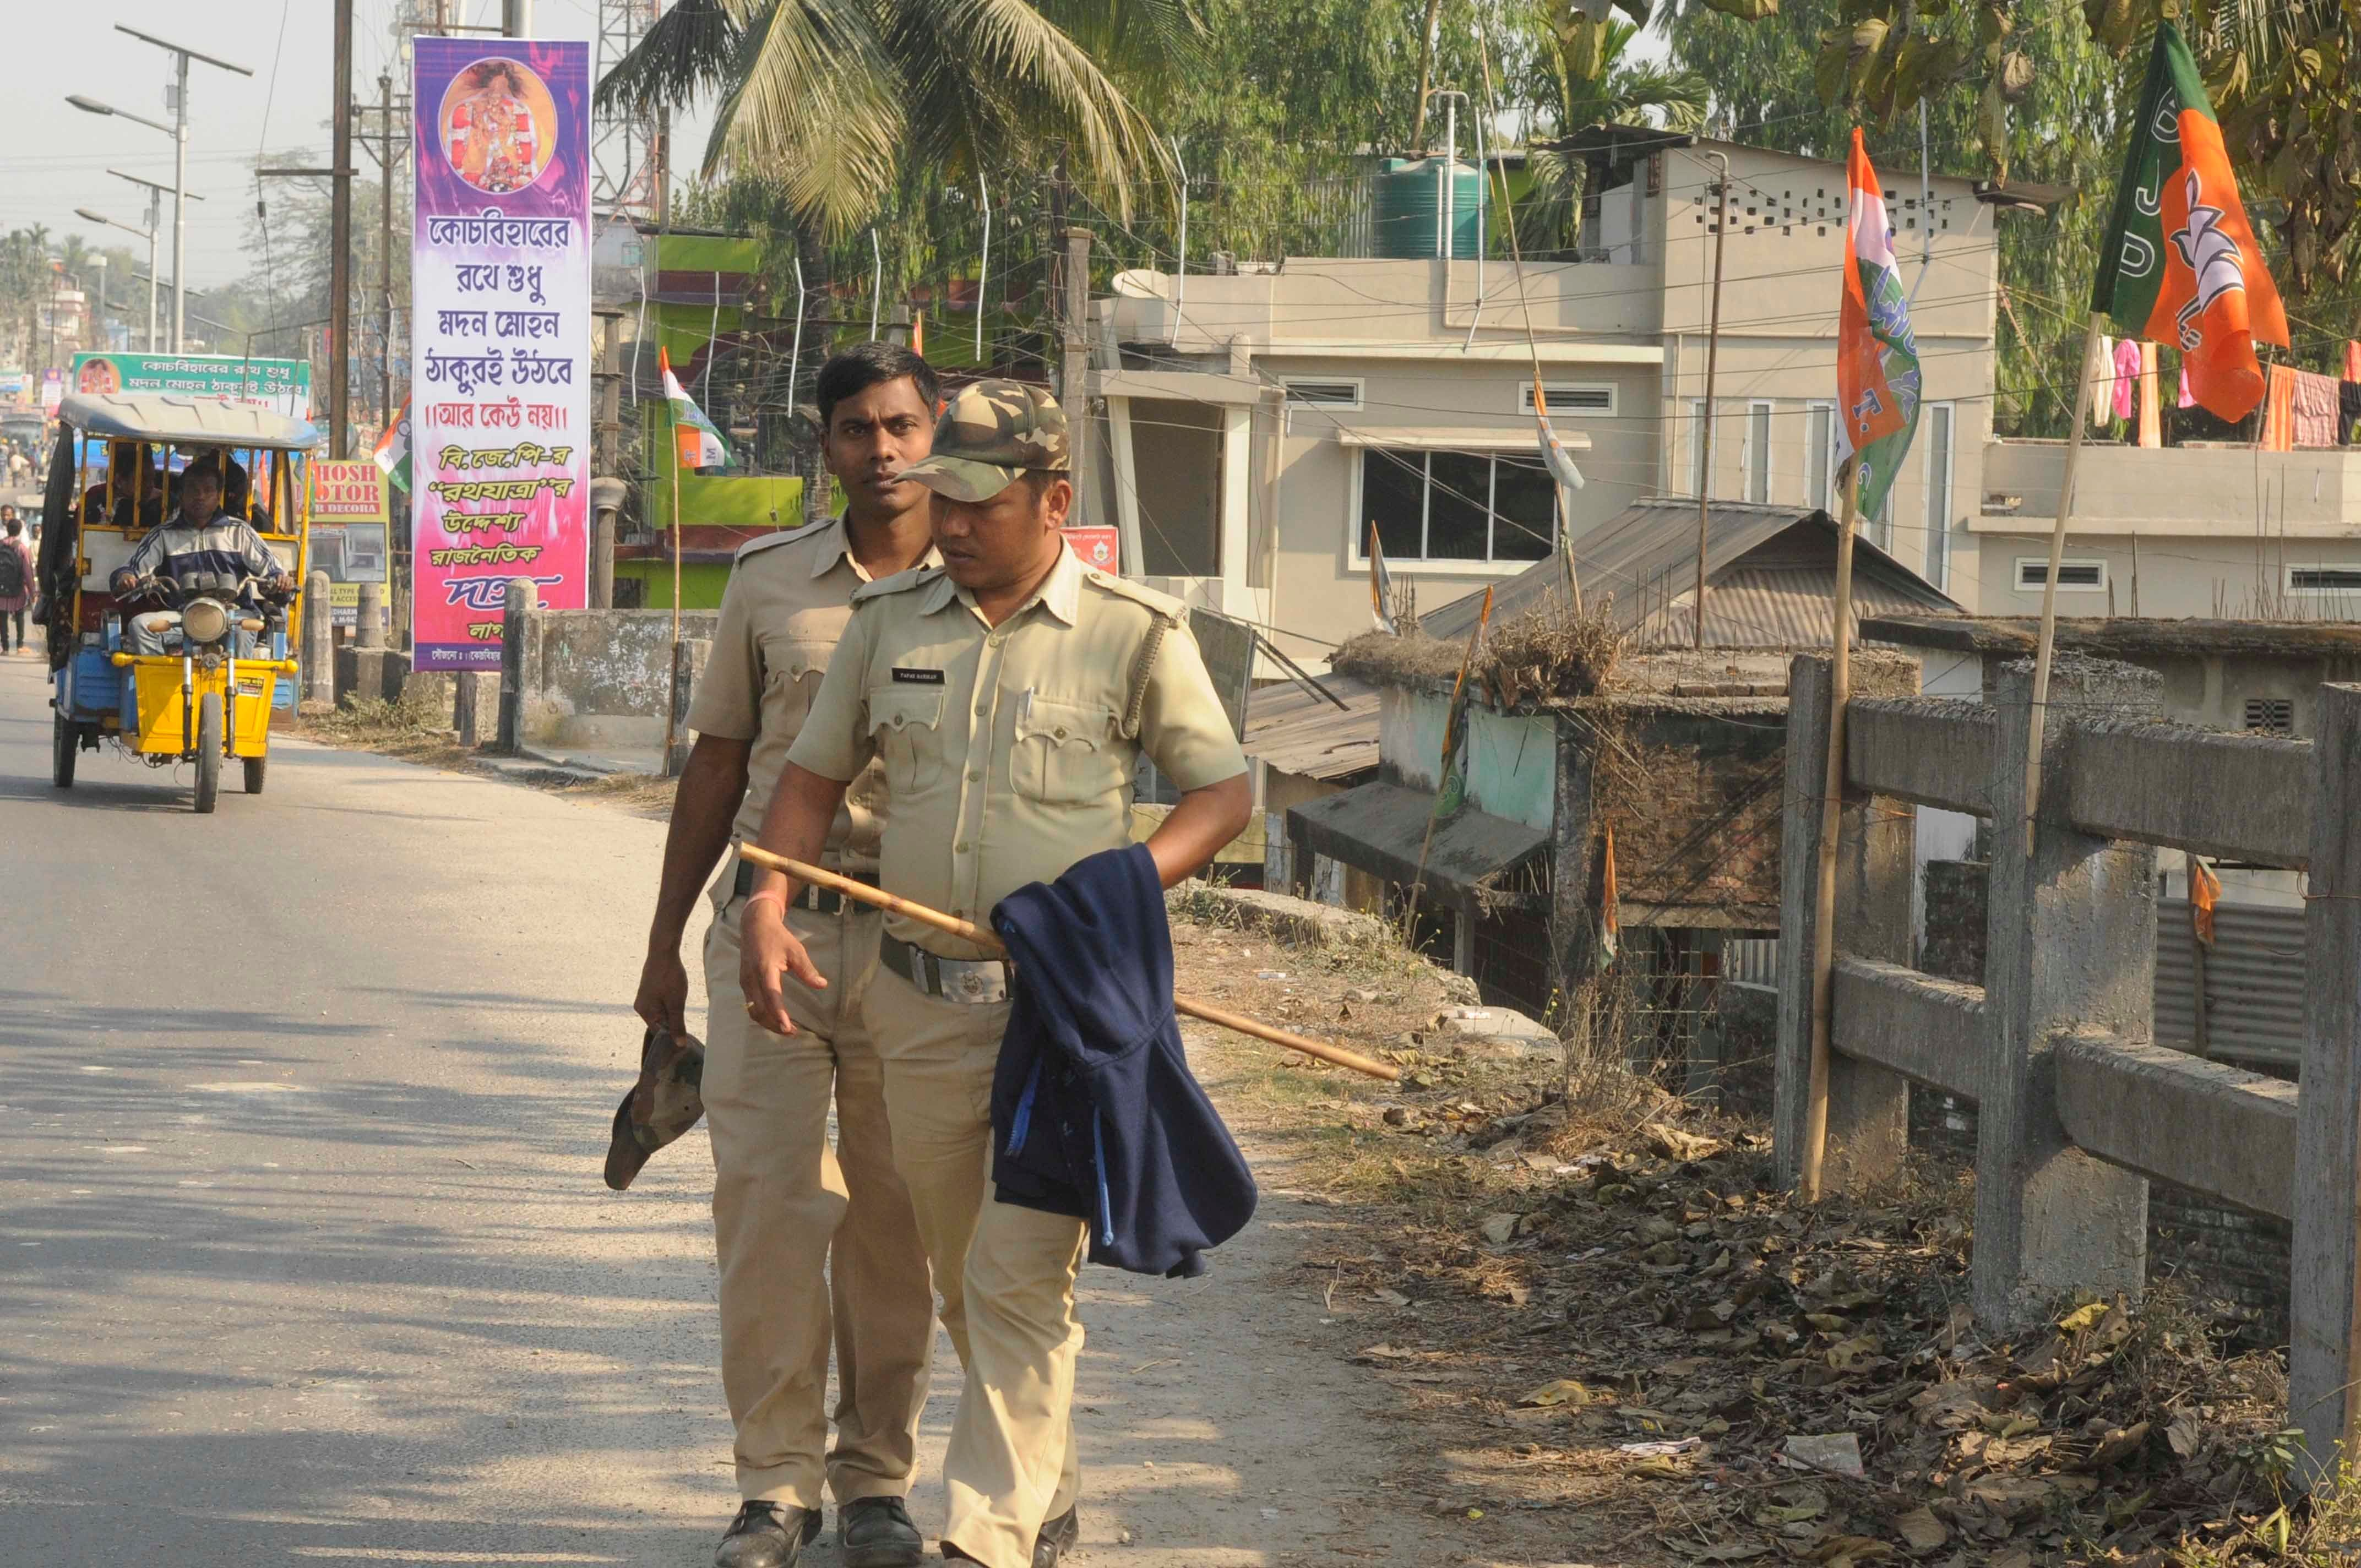 Bengal BJP Leader Arrested For Staging Daughter's